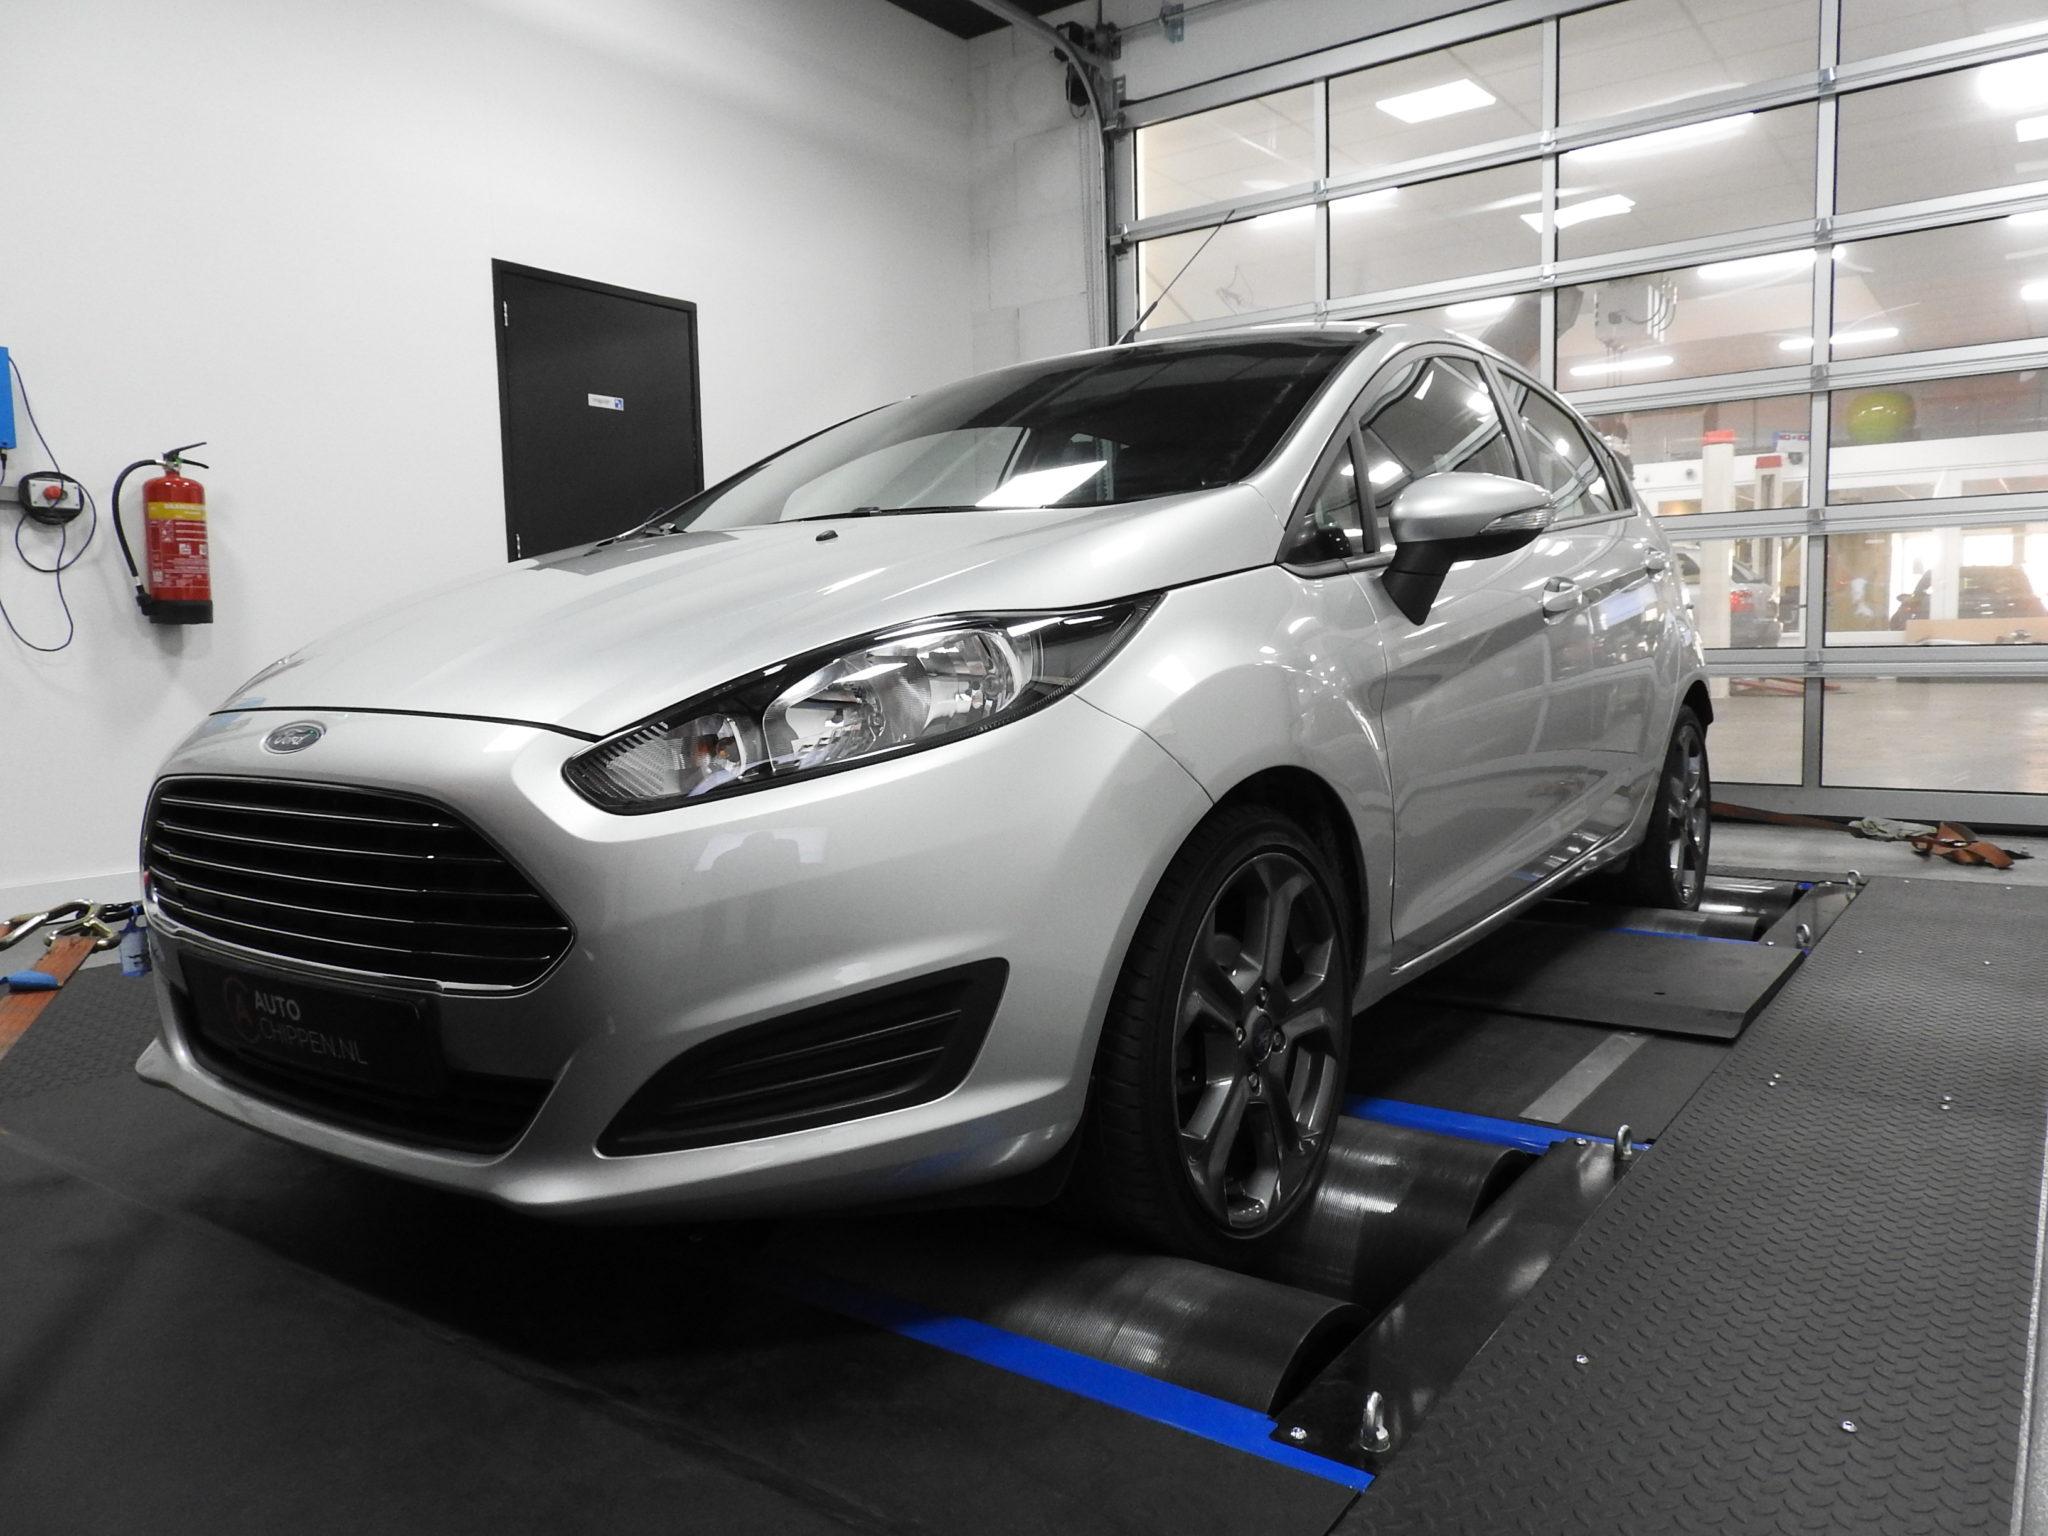 Ford Fiesta 1.0i